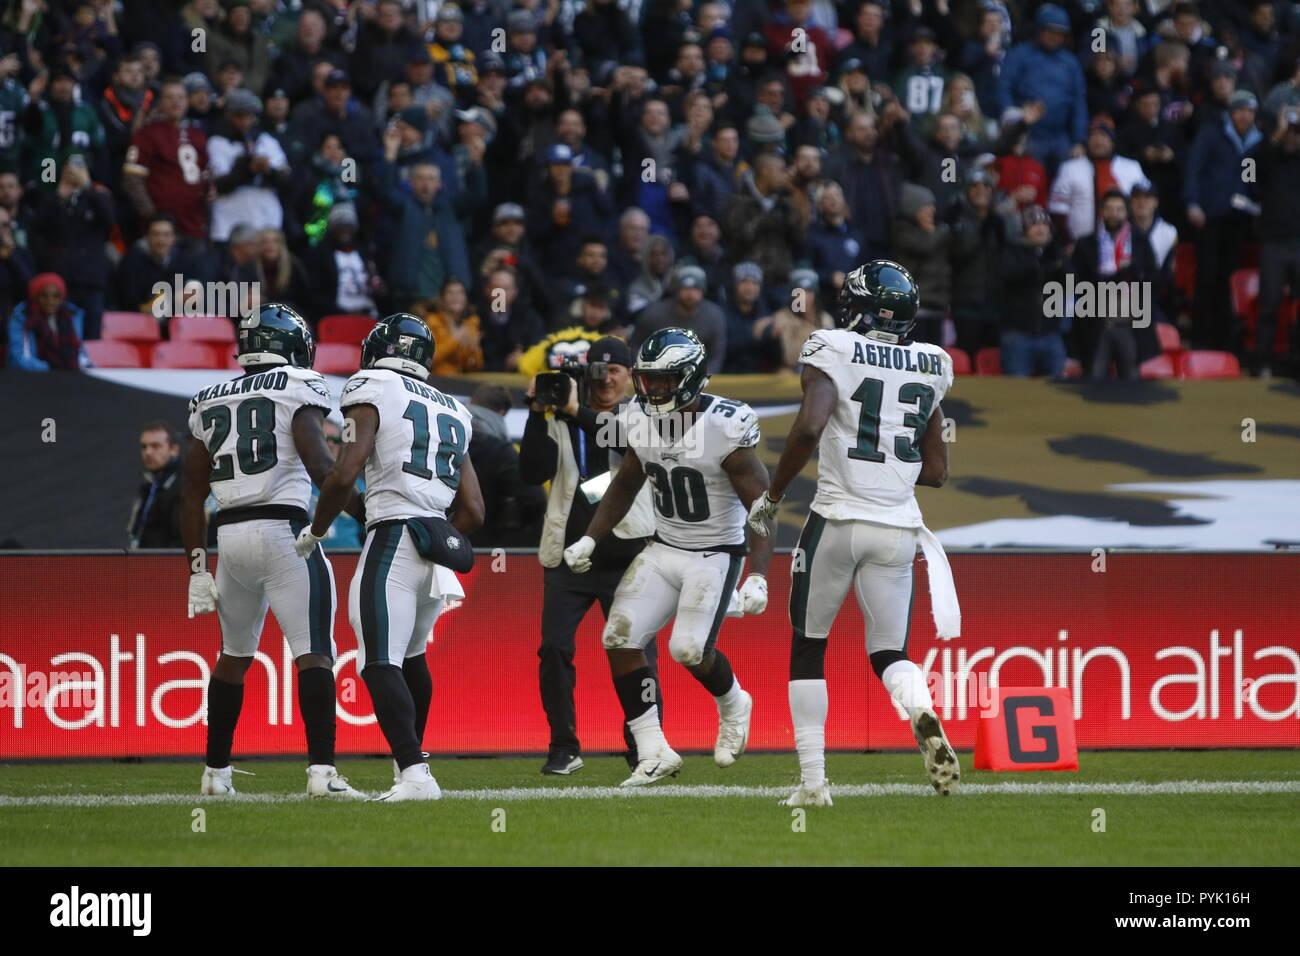 Londres, Royaume-Uni. 28 octobre 2018. Philadelphia Eagles Running Back Wendell Smallwood (28) célèbre son à l'Eagles à Jaguars - Glamourstock glamourstock crédit: Crédit/Alamy Live News Banque D'Images